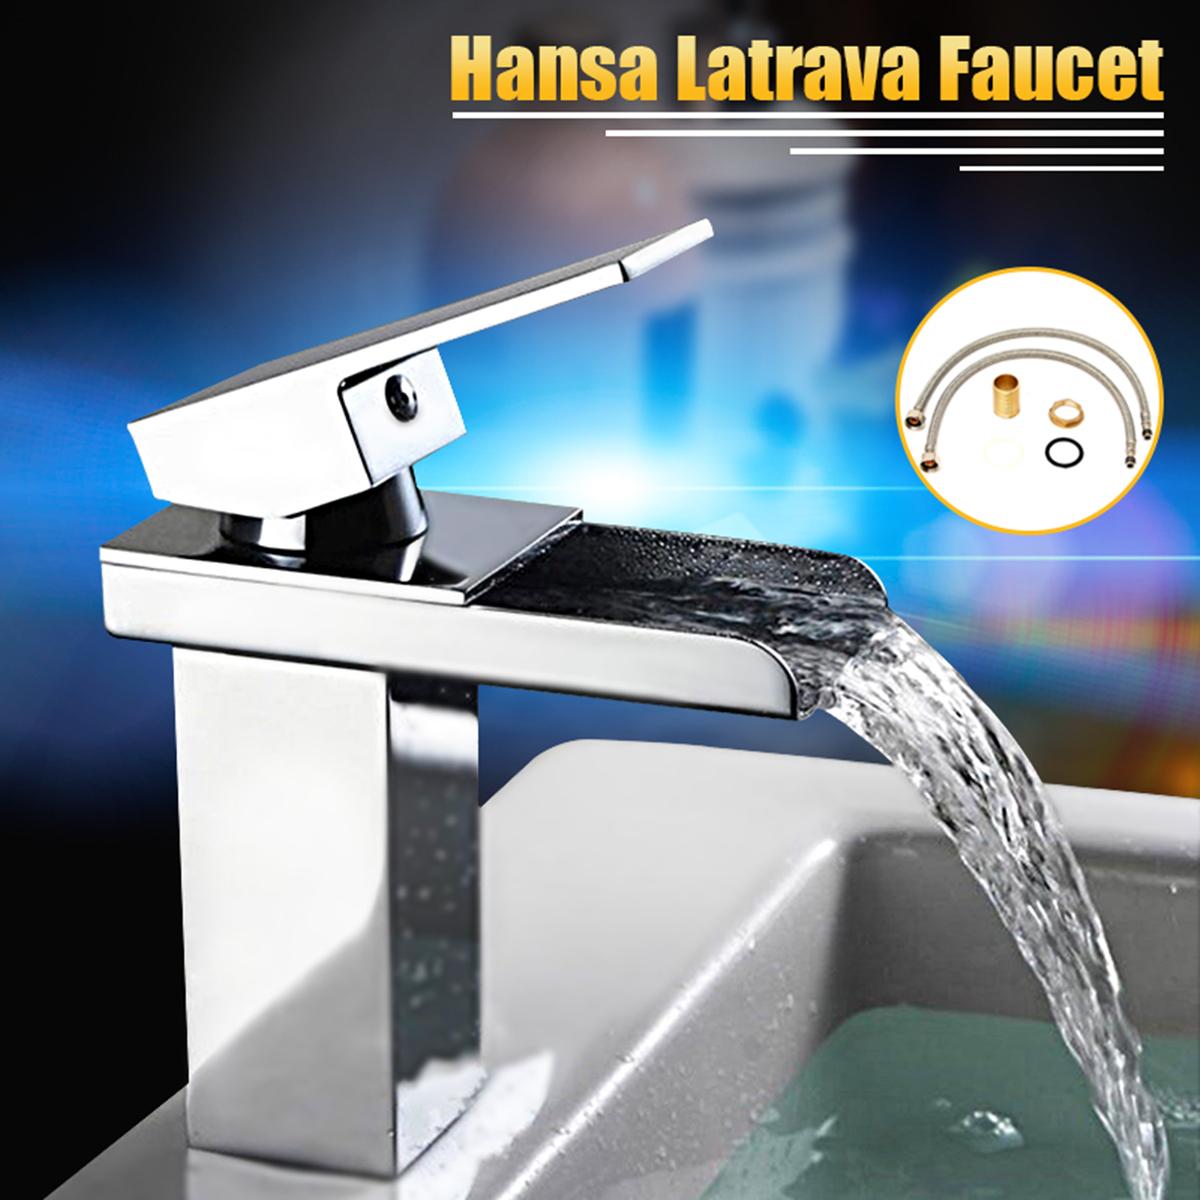 Catalogue Kitea Salle De Bain ~ tempsa robinet mitigeur chute cuisine cascade evier salle de bain